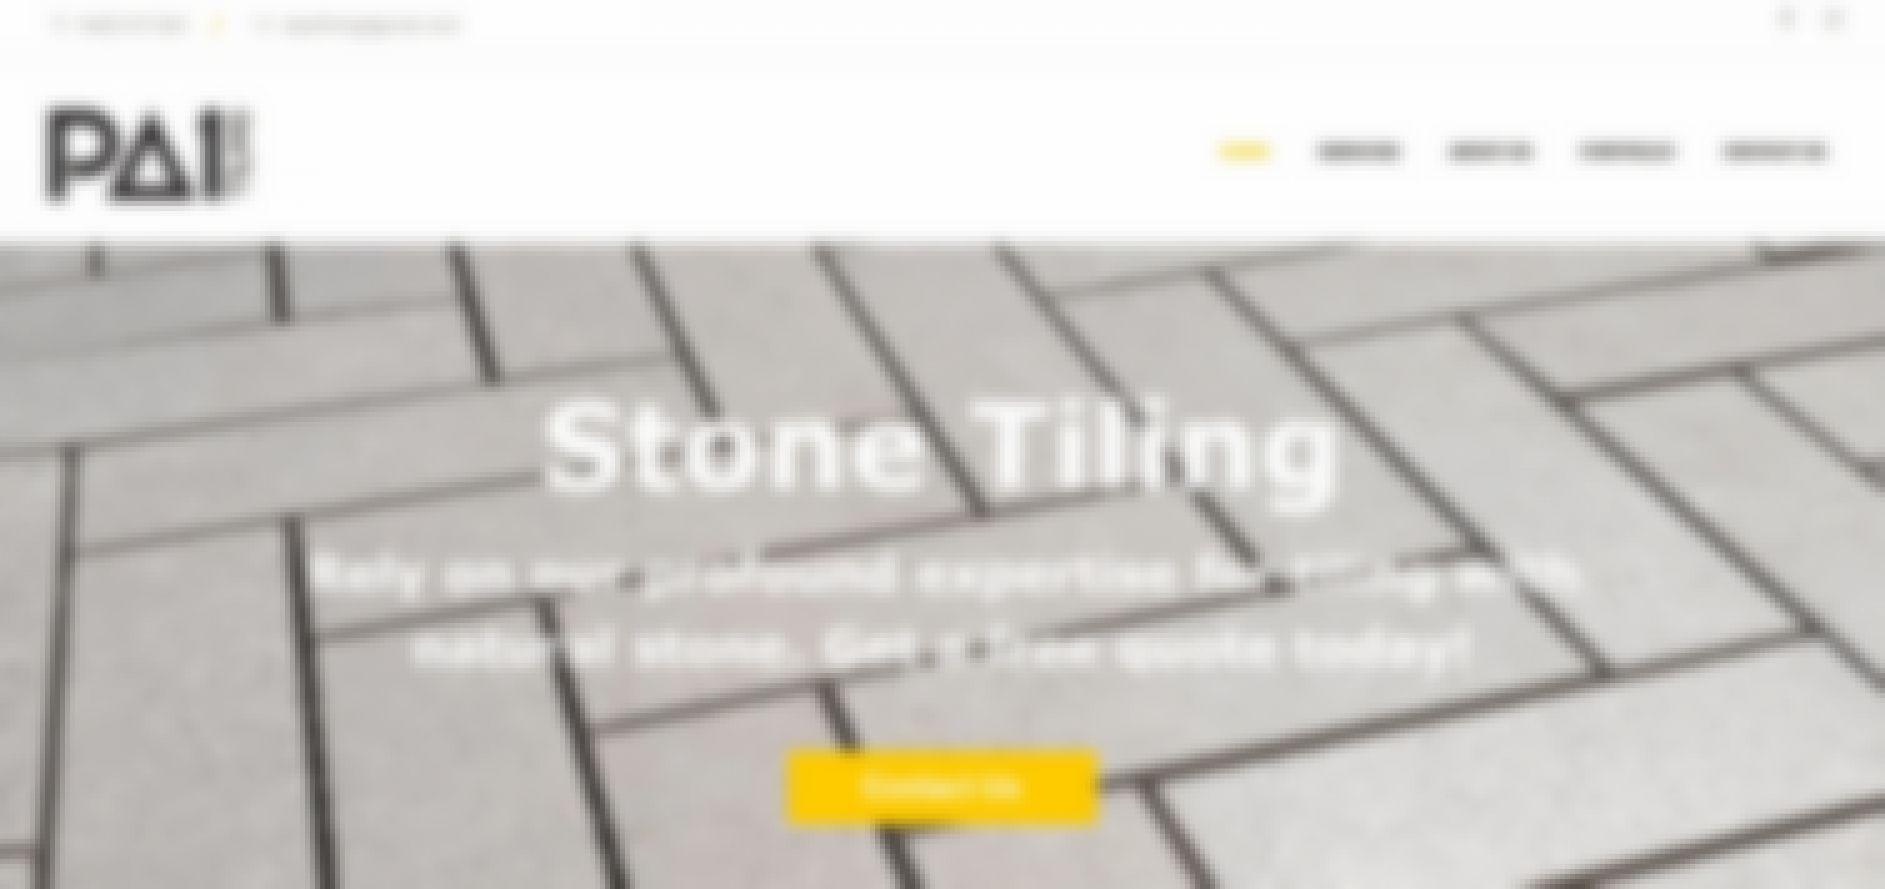 pa1 tiling melbourne